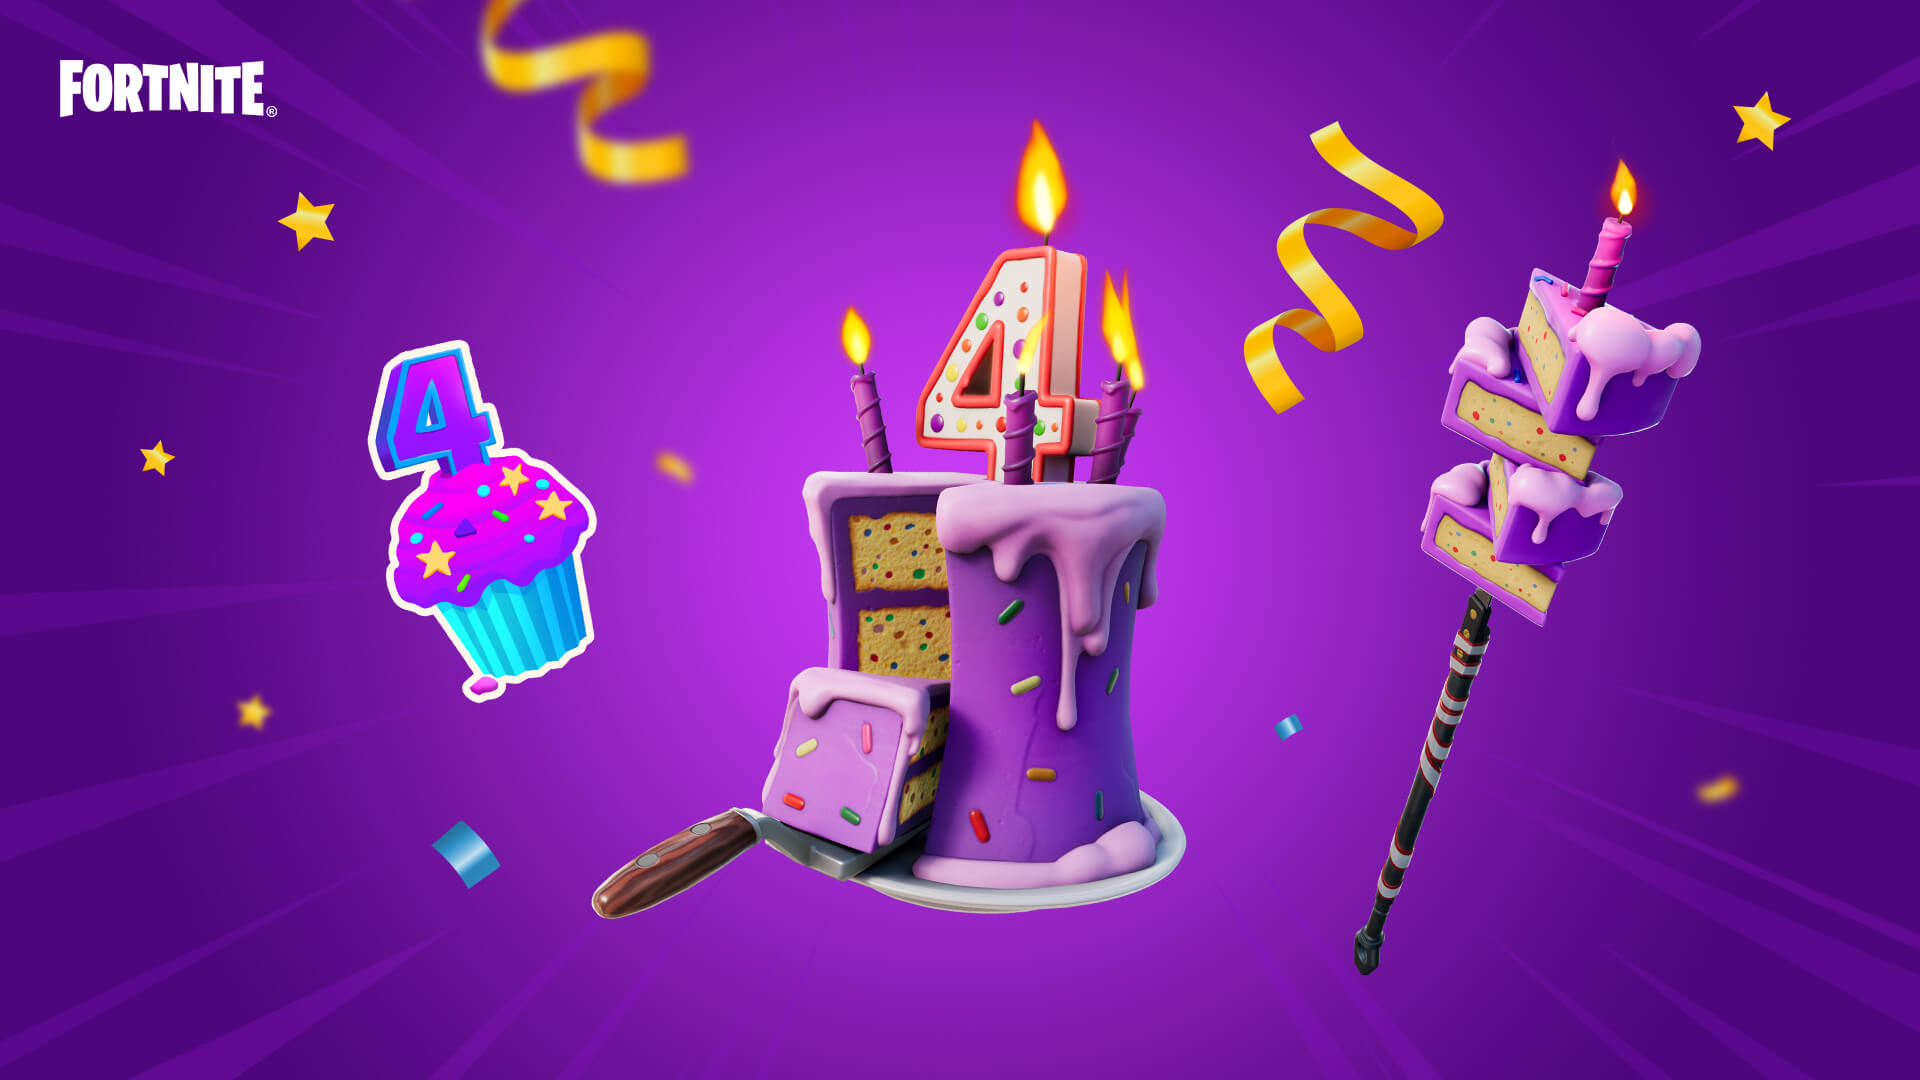 Fortnite Birthday Quest Rewards